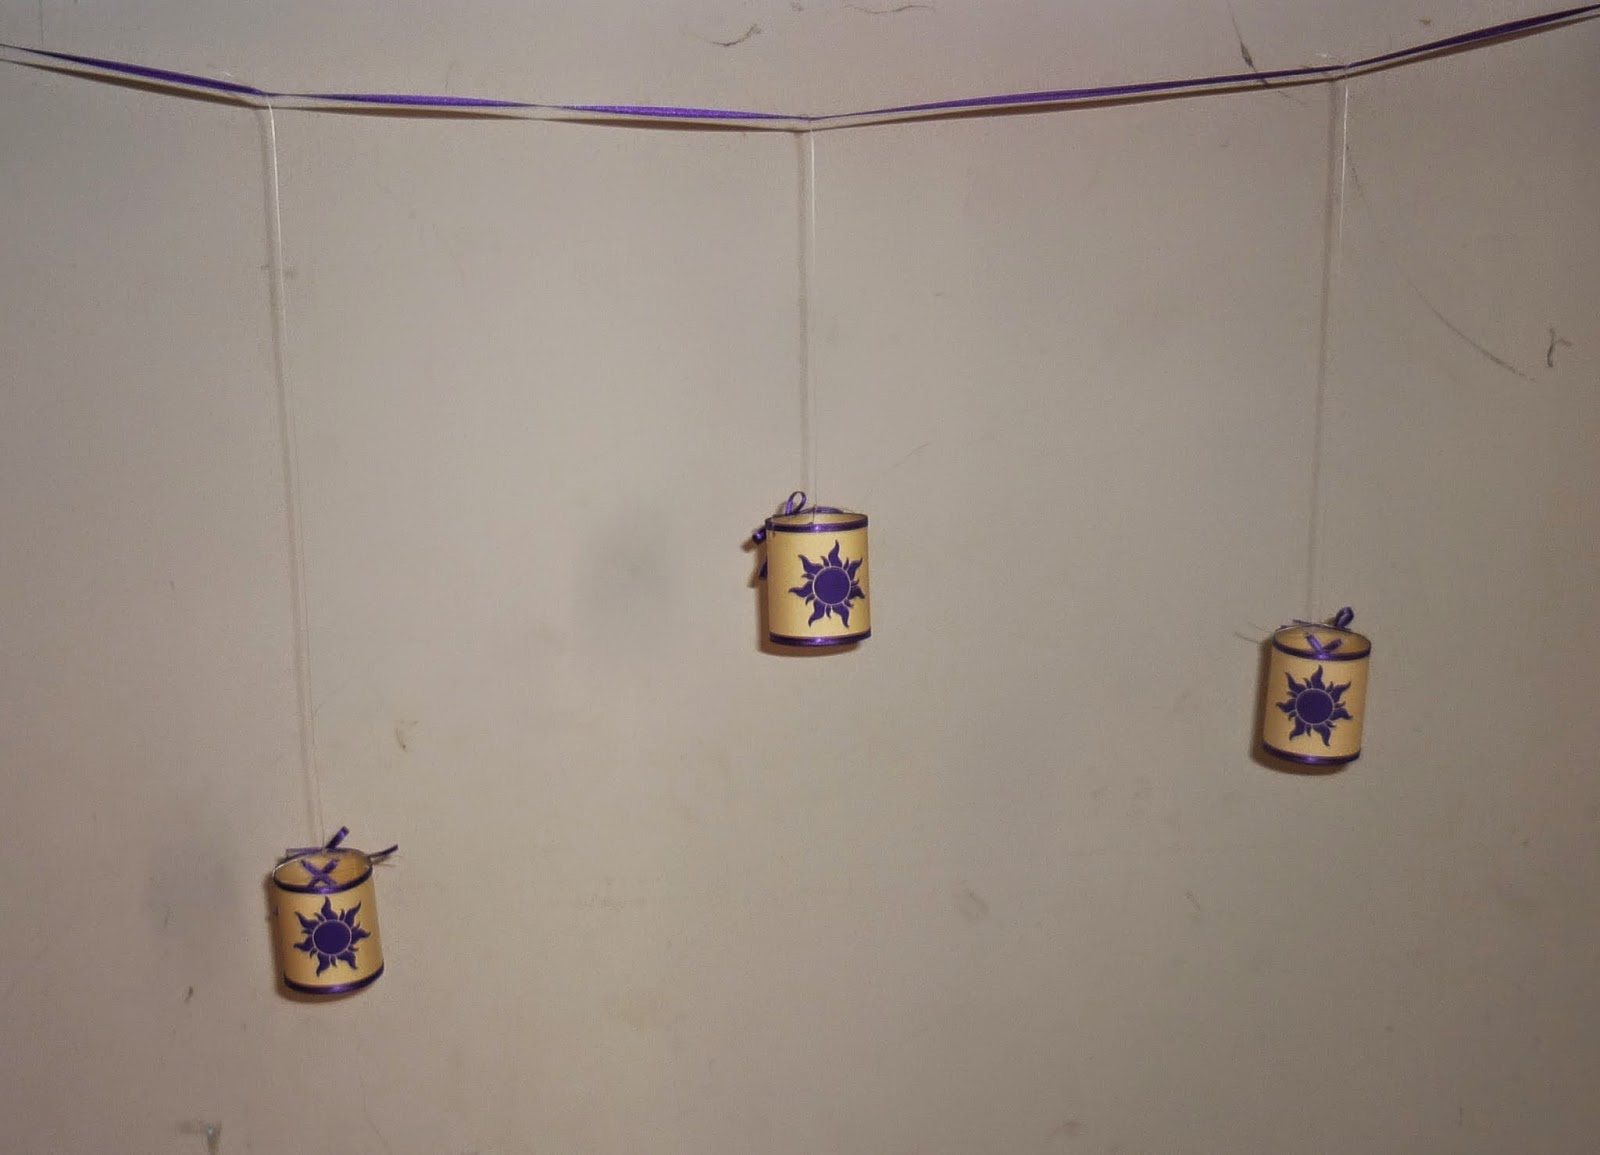 Minimandy. Linternas. Rapunzel. Tangled. Enredados. Guirnaldas. Luces.